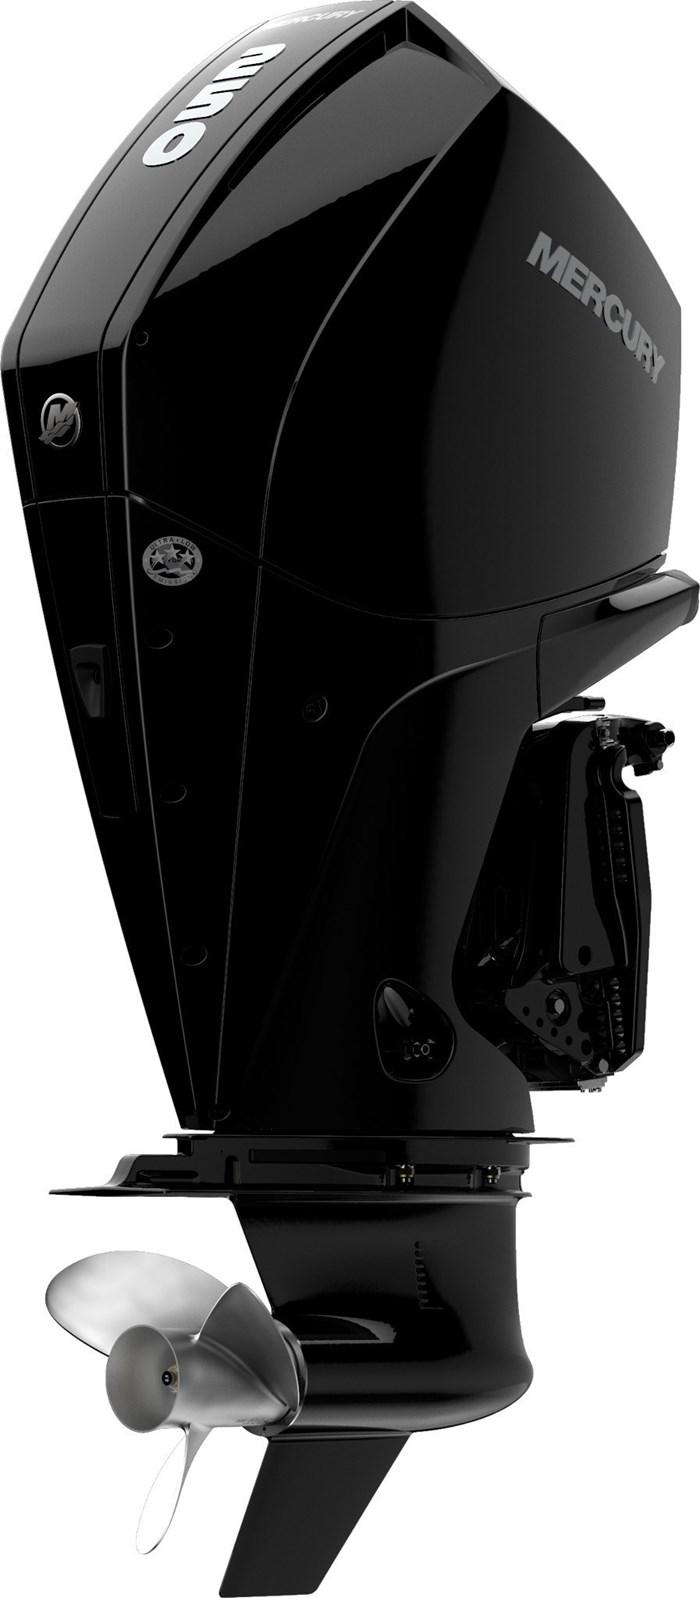 2022 Mercury 250CXL V-8 4-Stroke DTS Photo 8 sur 28